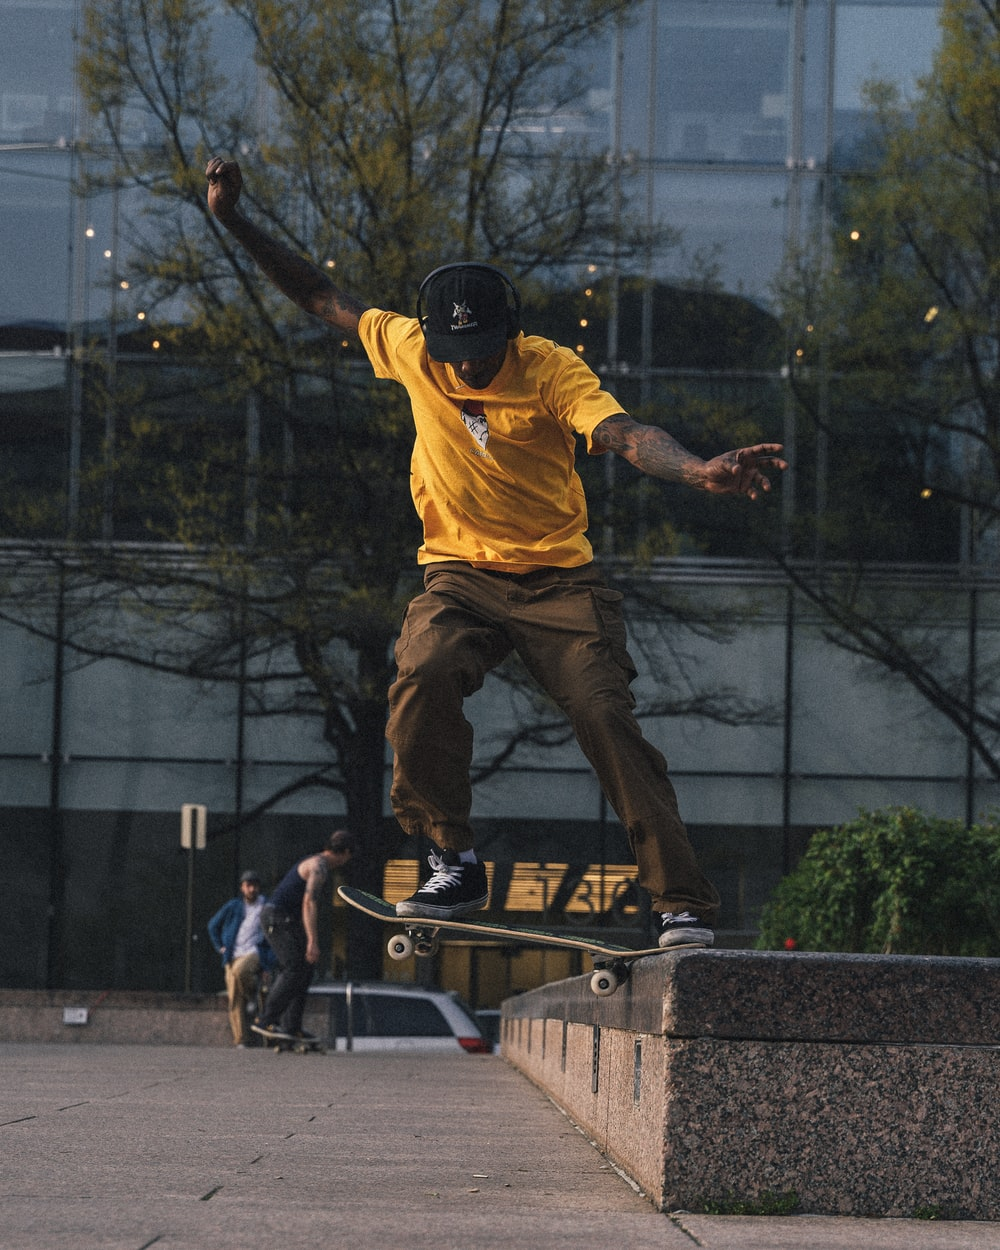 man in yellow shirt and brown pants playing skateboard